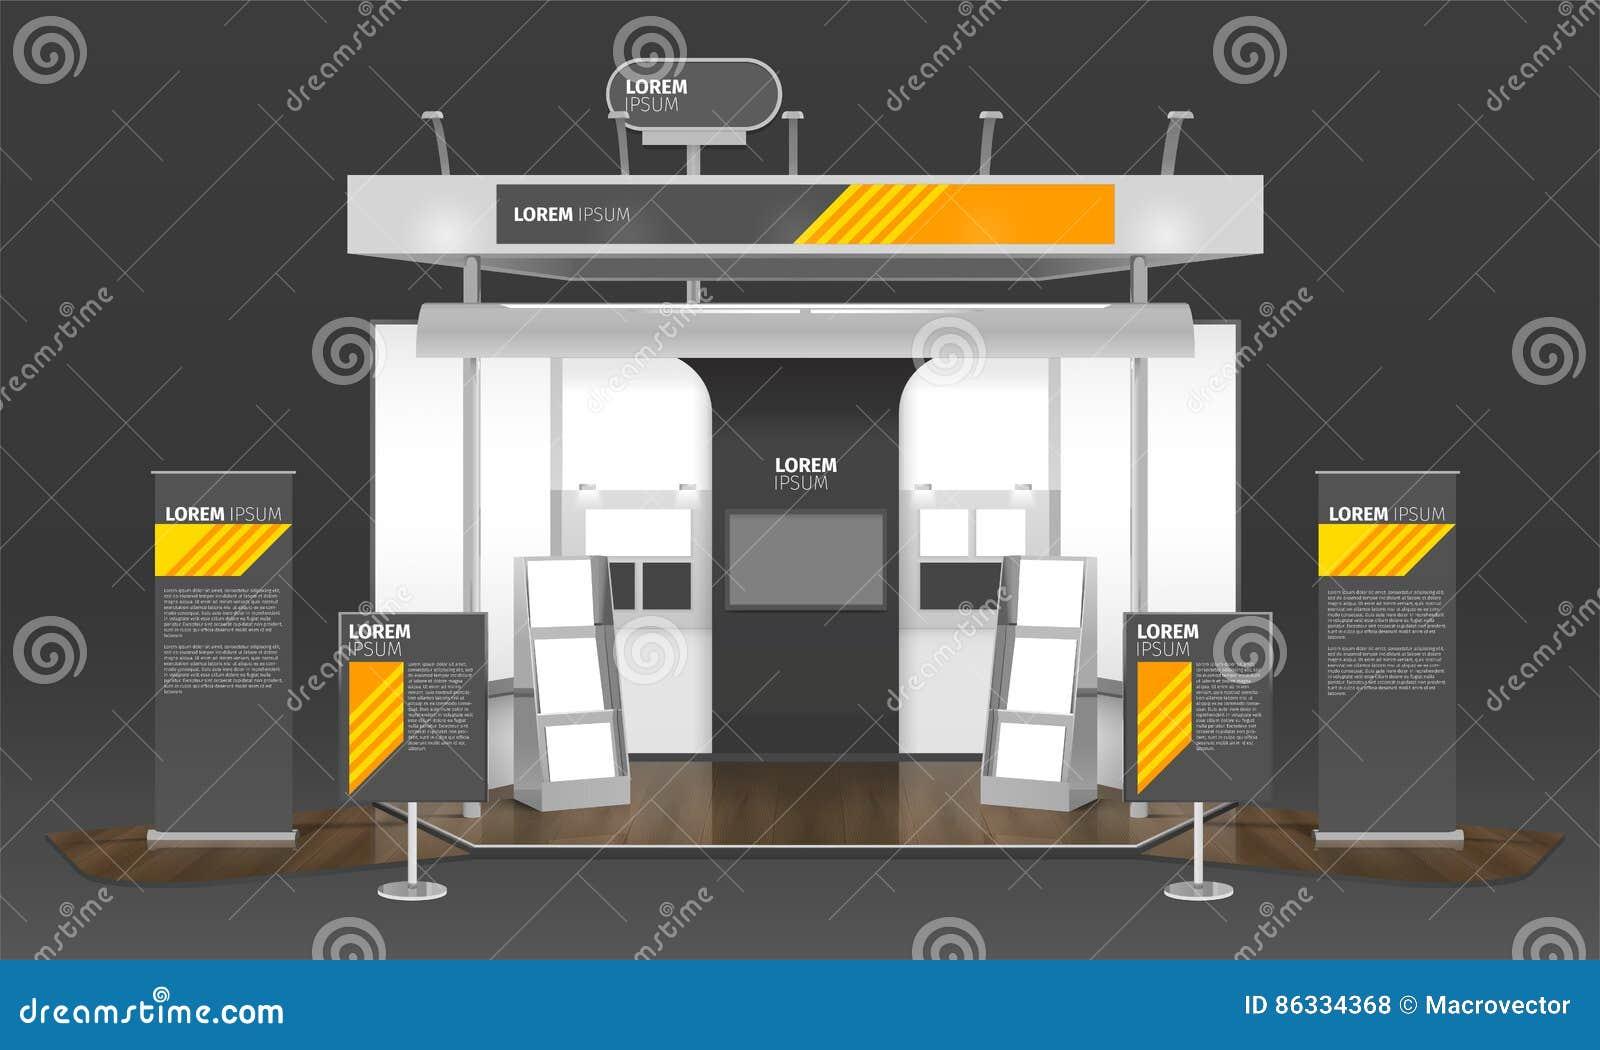 Exhibition Stand Poster Design : Exhibition case design d composition stock vector illustration